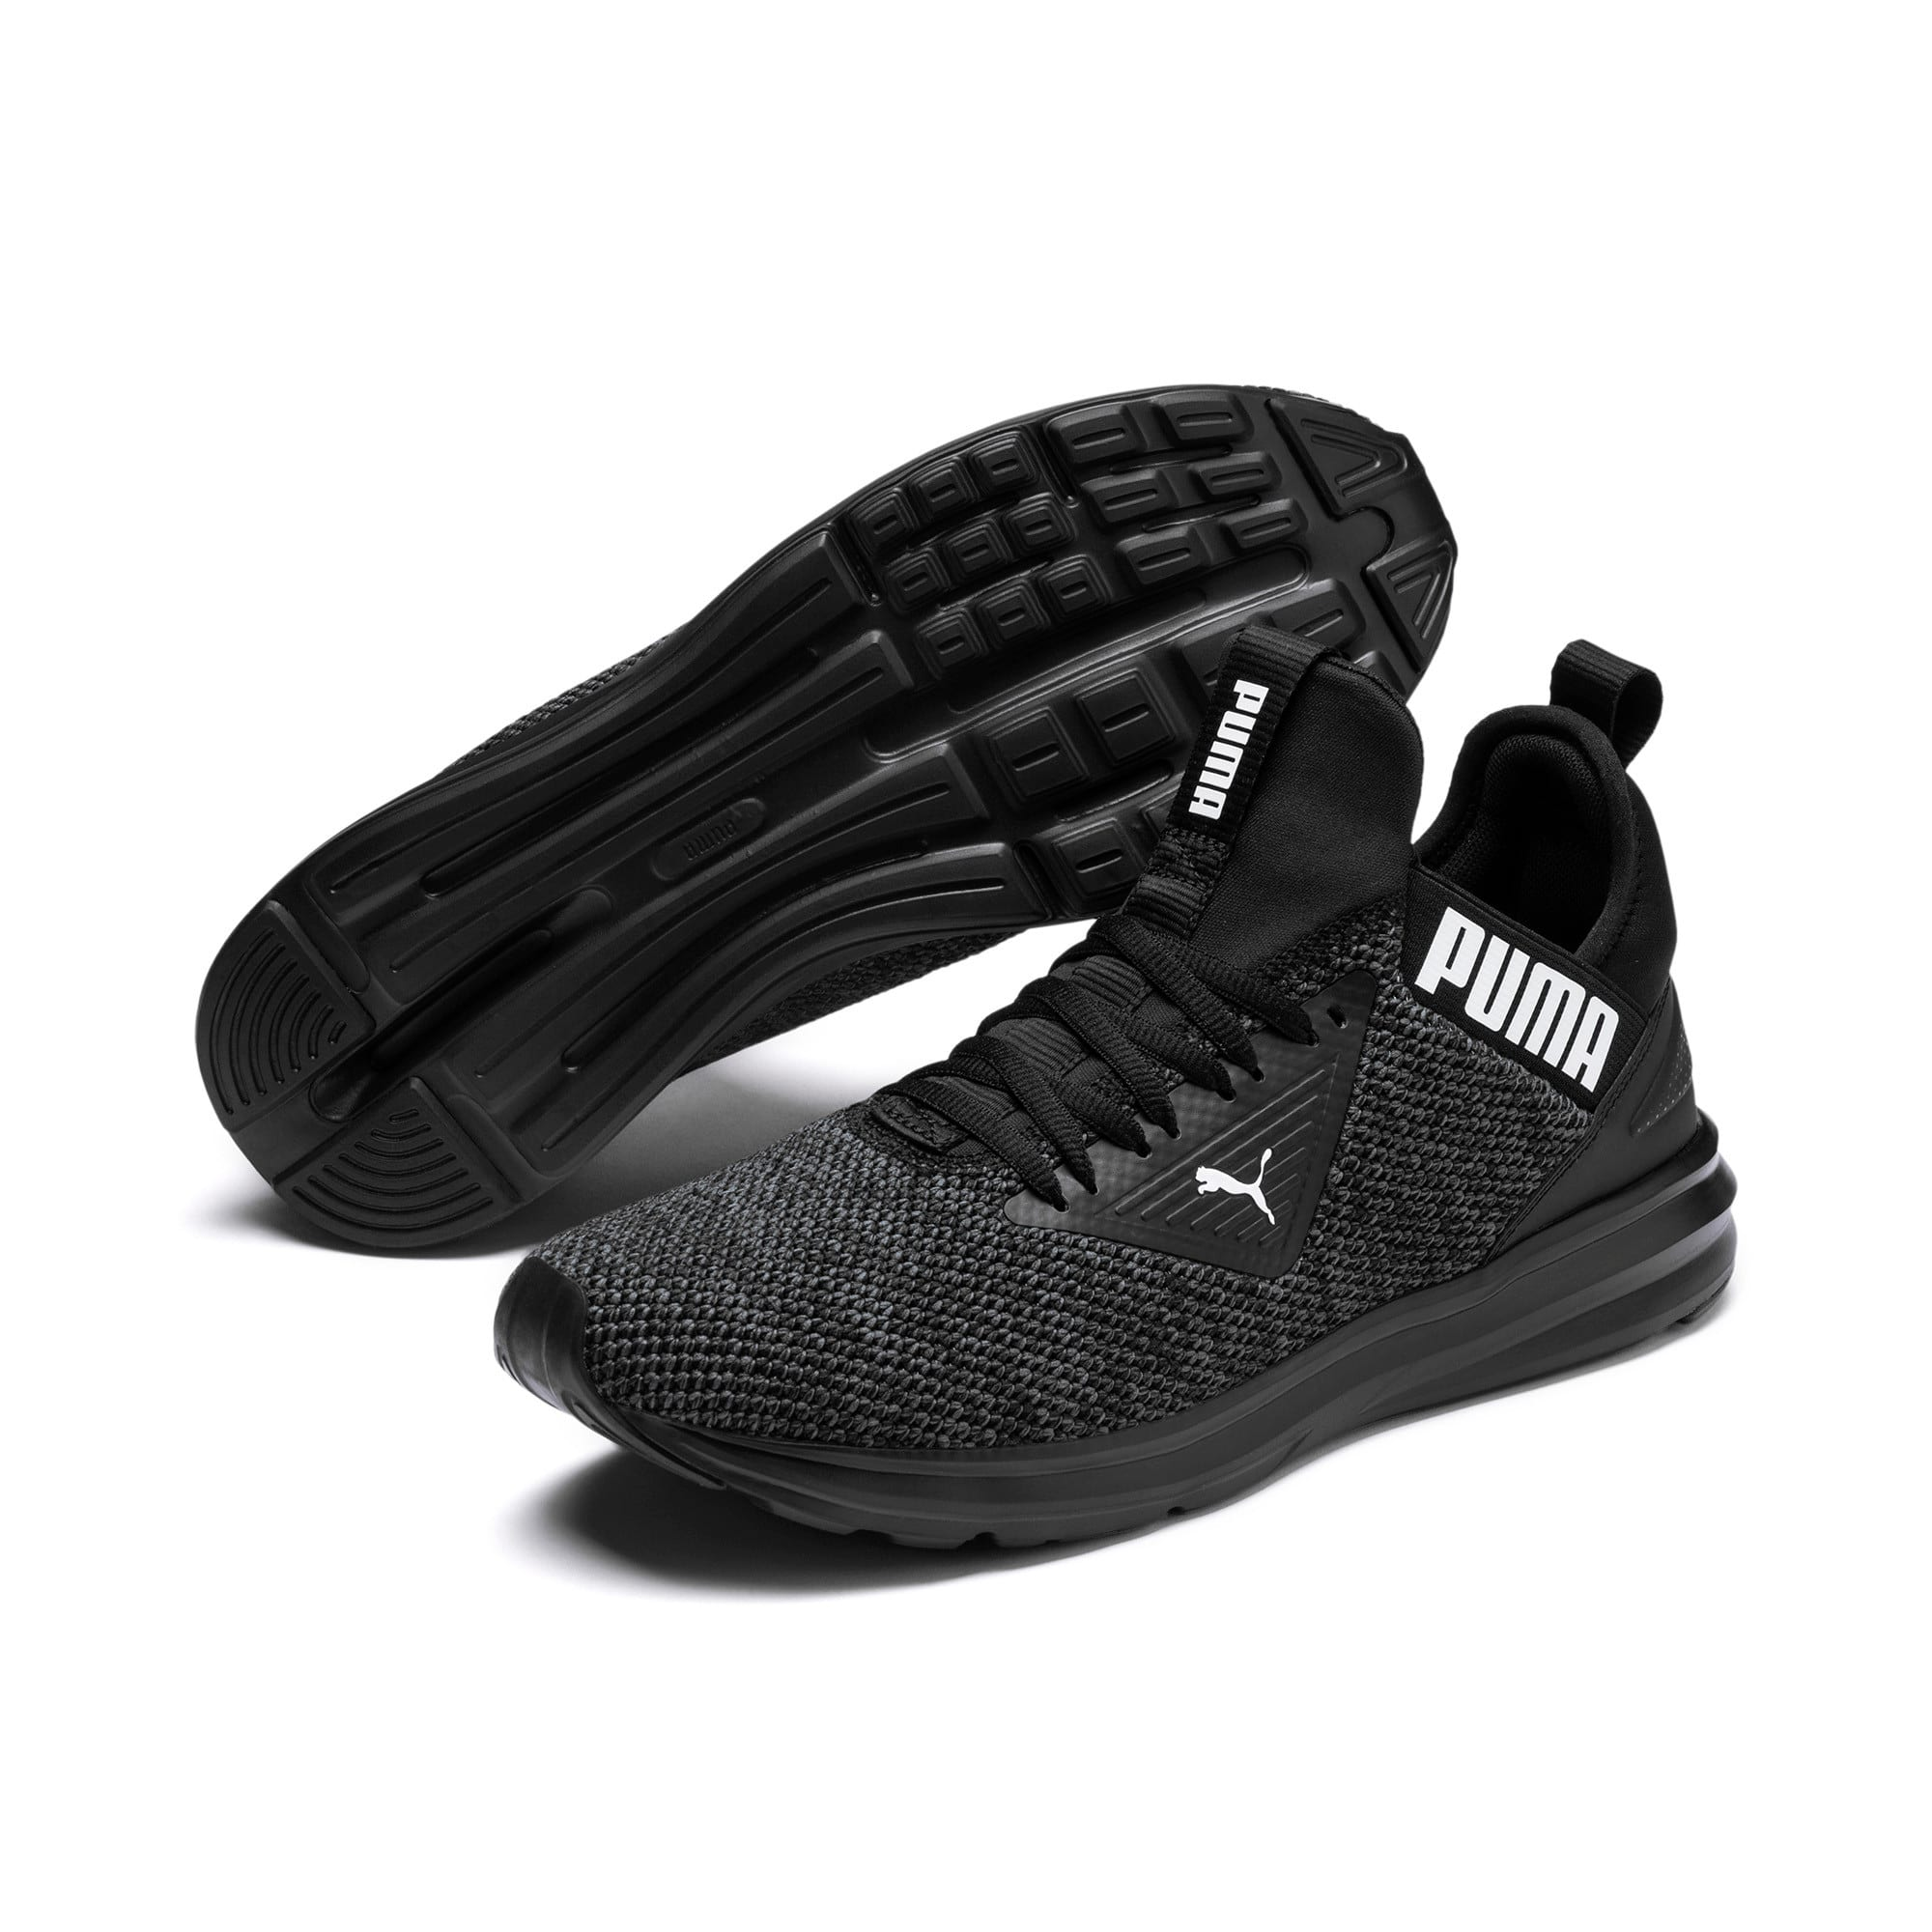 Thumbnail 2 of Enzo Beta Woven Men's Training Shoes, Puma Black-Asphalt, medium